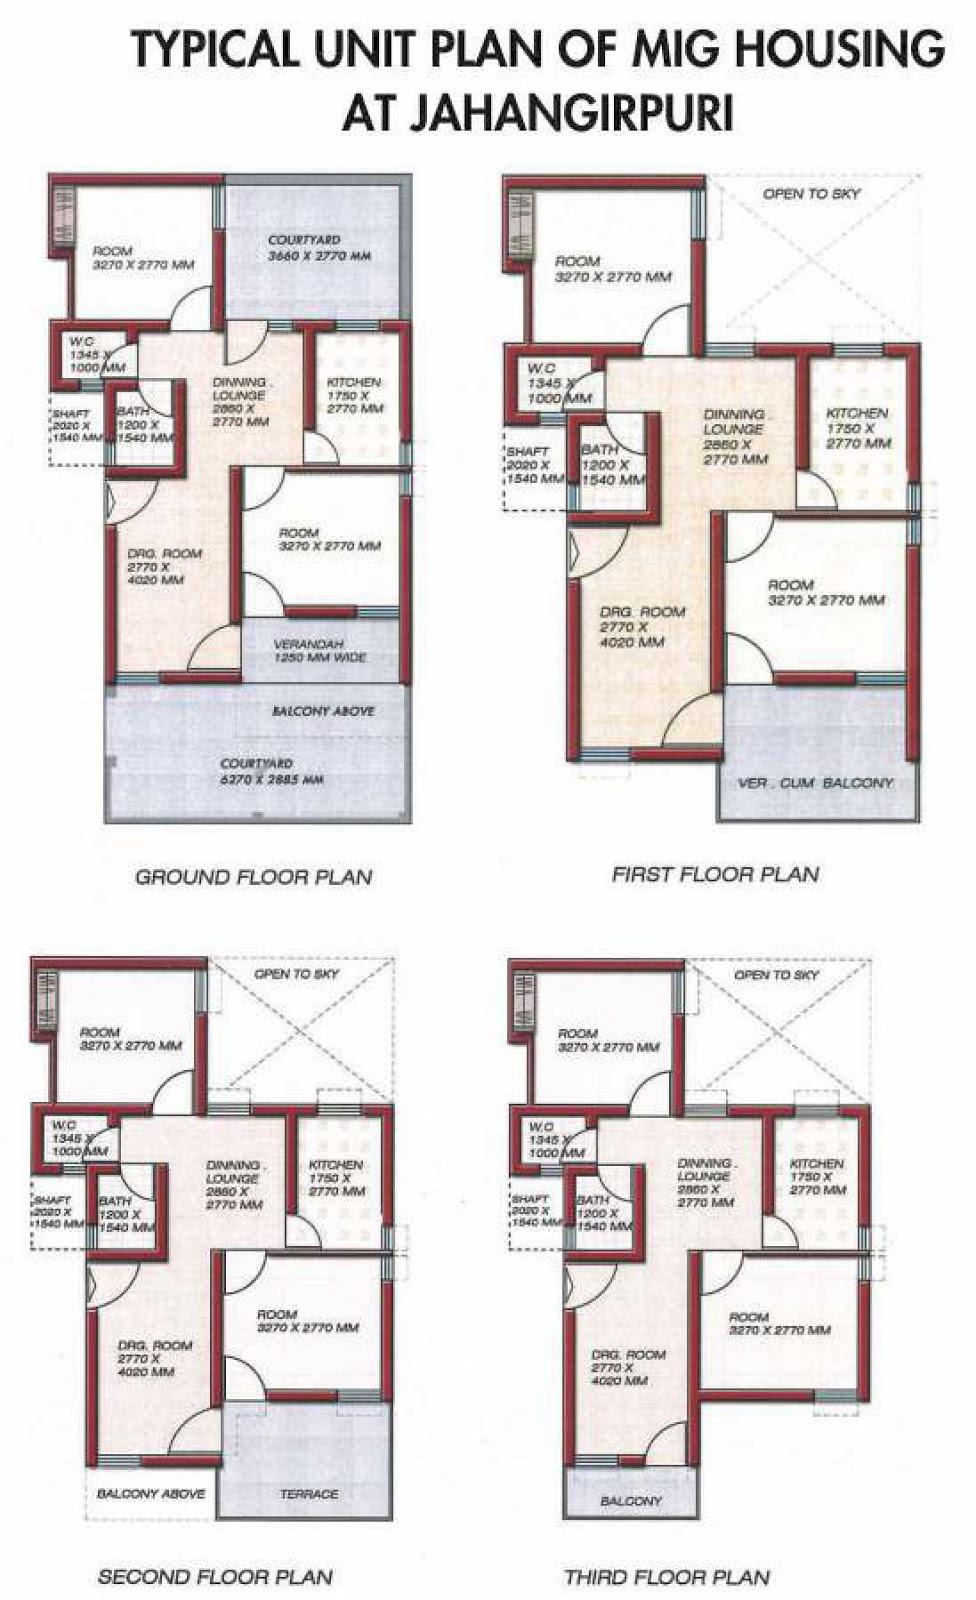 Dda Housing Scheme 2014 Pdf